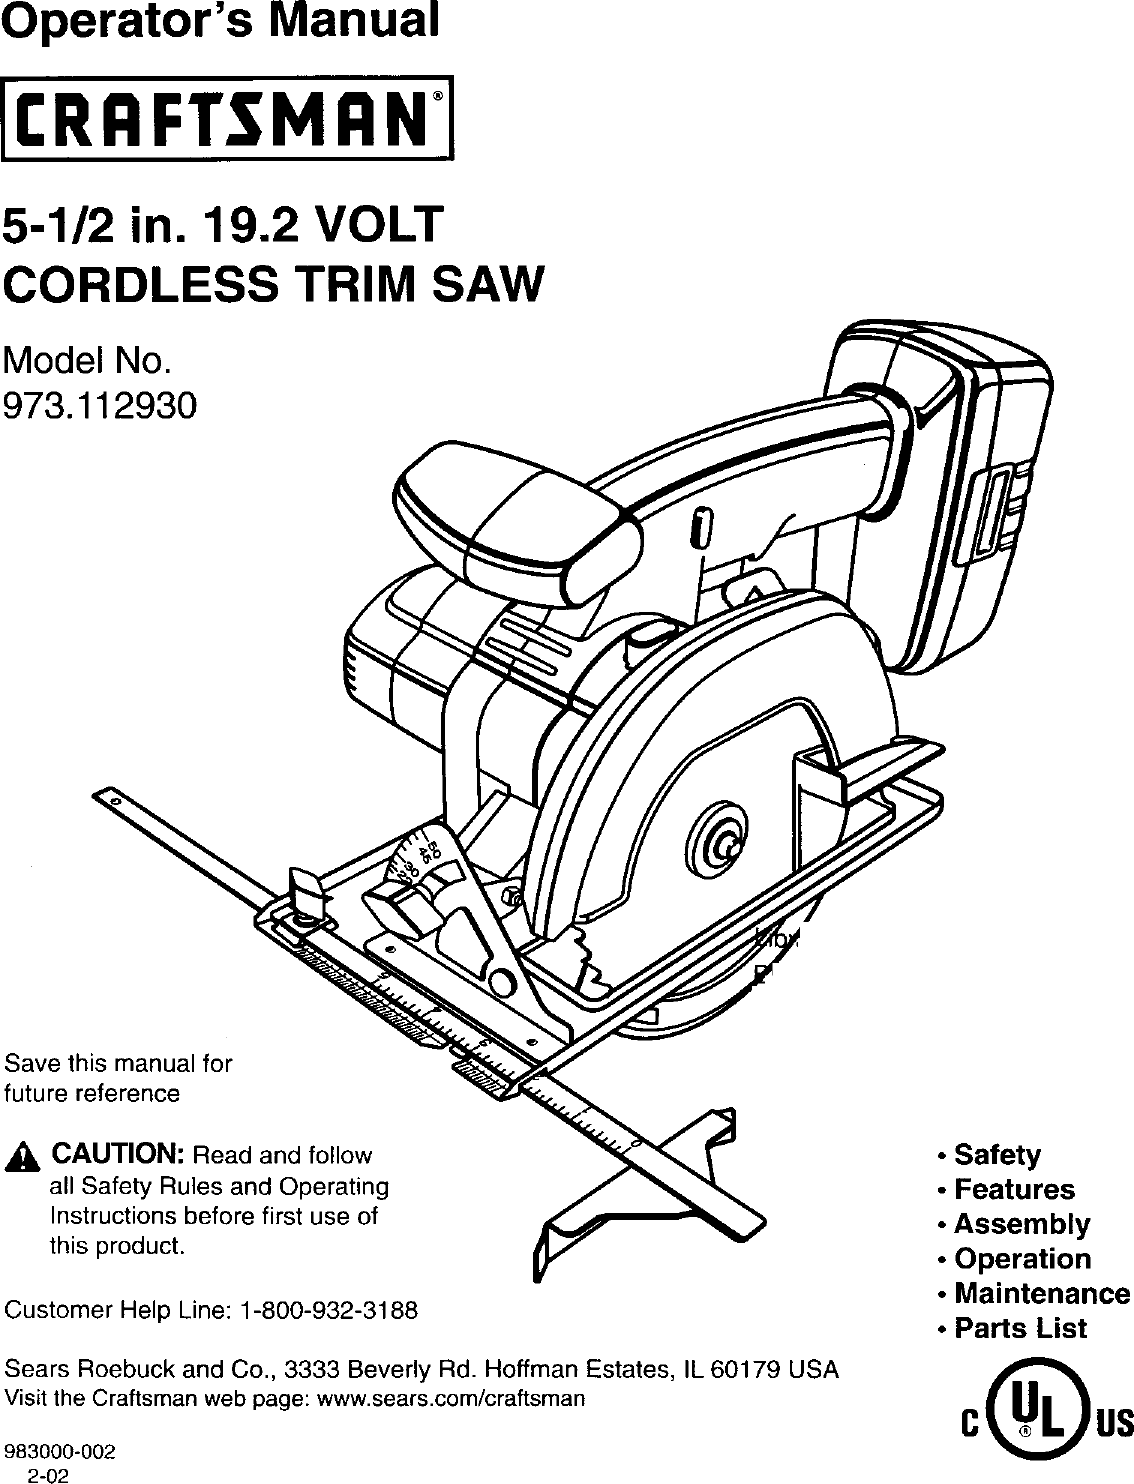 Craftsman 973112930 User Manual 19.2 VOLT CORDLESS TRIM